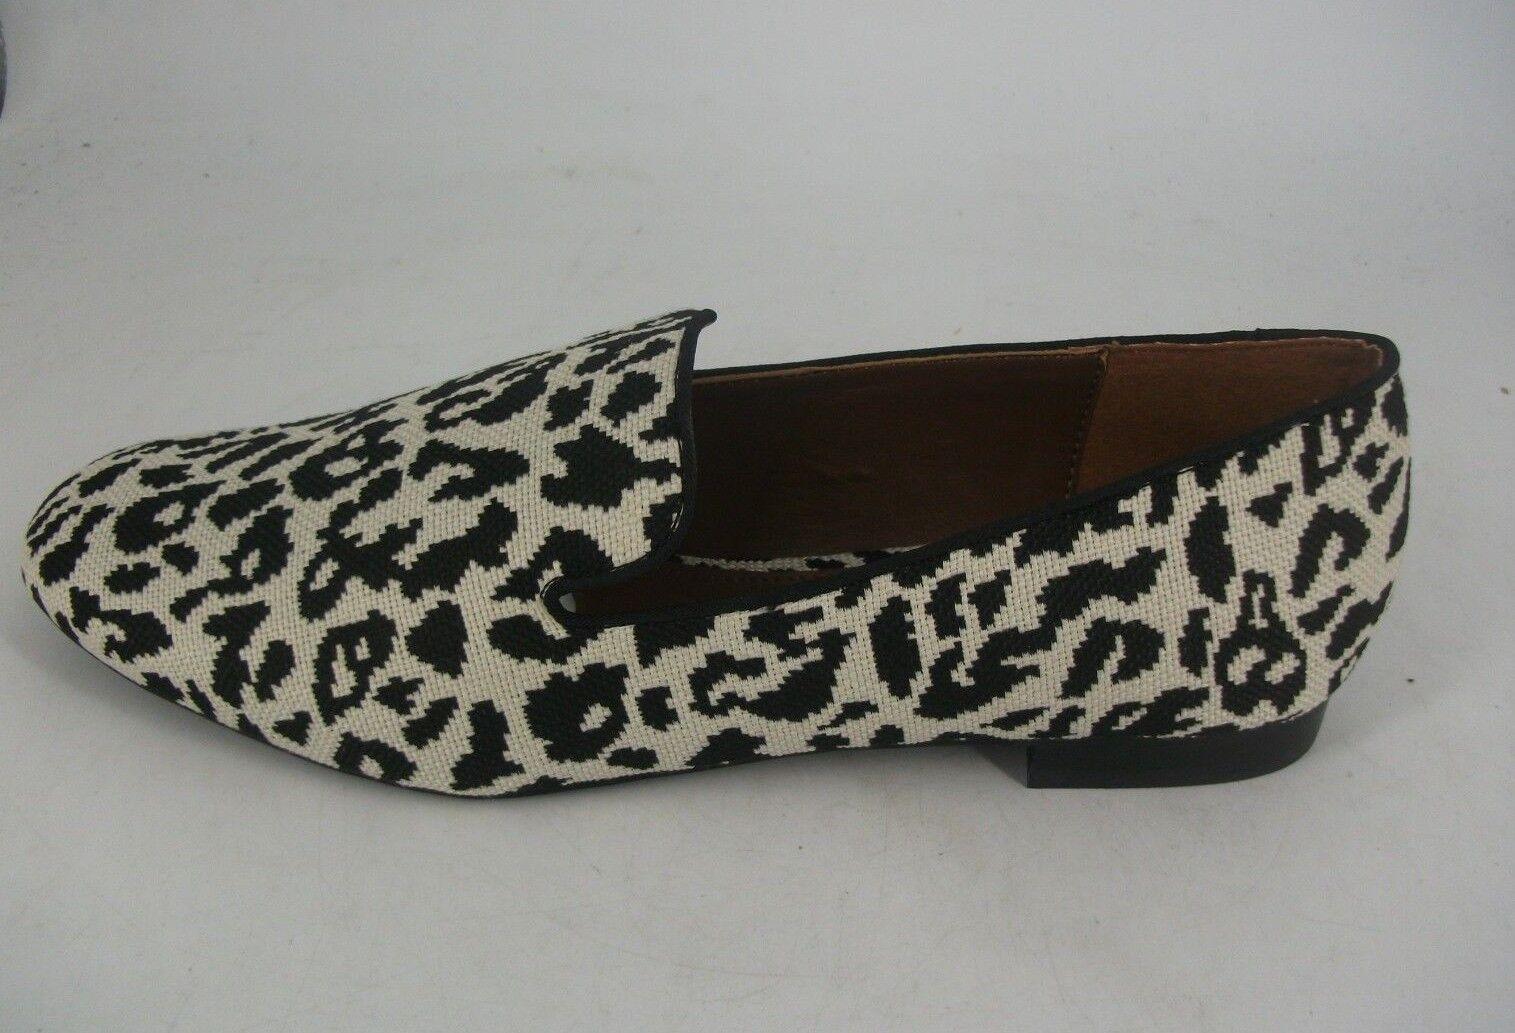 NEXT Animal Print Textile Loafers UK 7 EU 41 JS182 XX 07